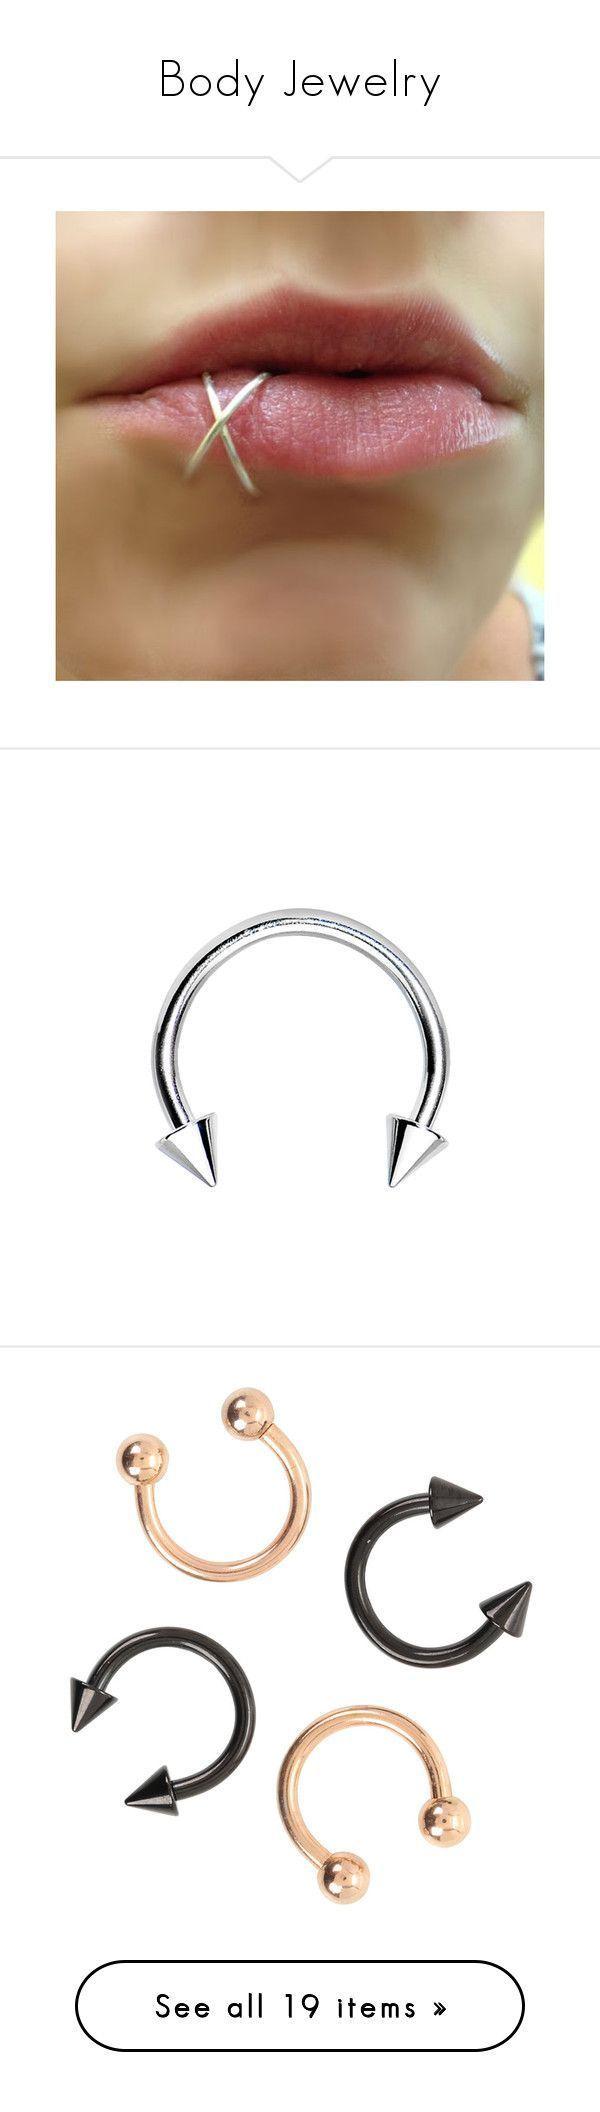 Nose piercing post  Body Jewelry